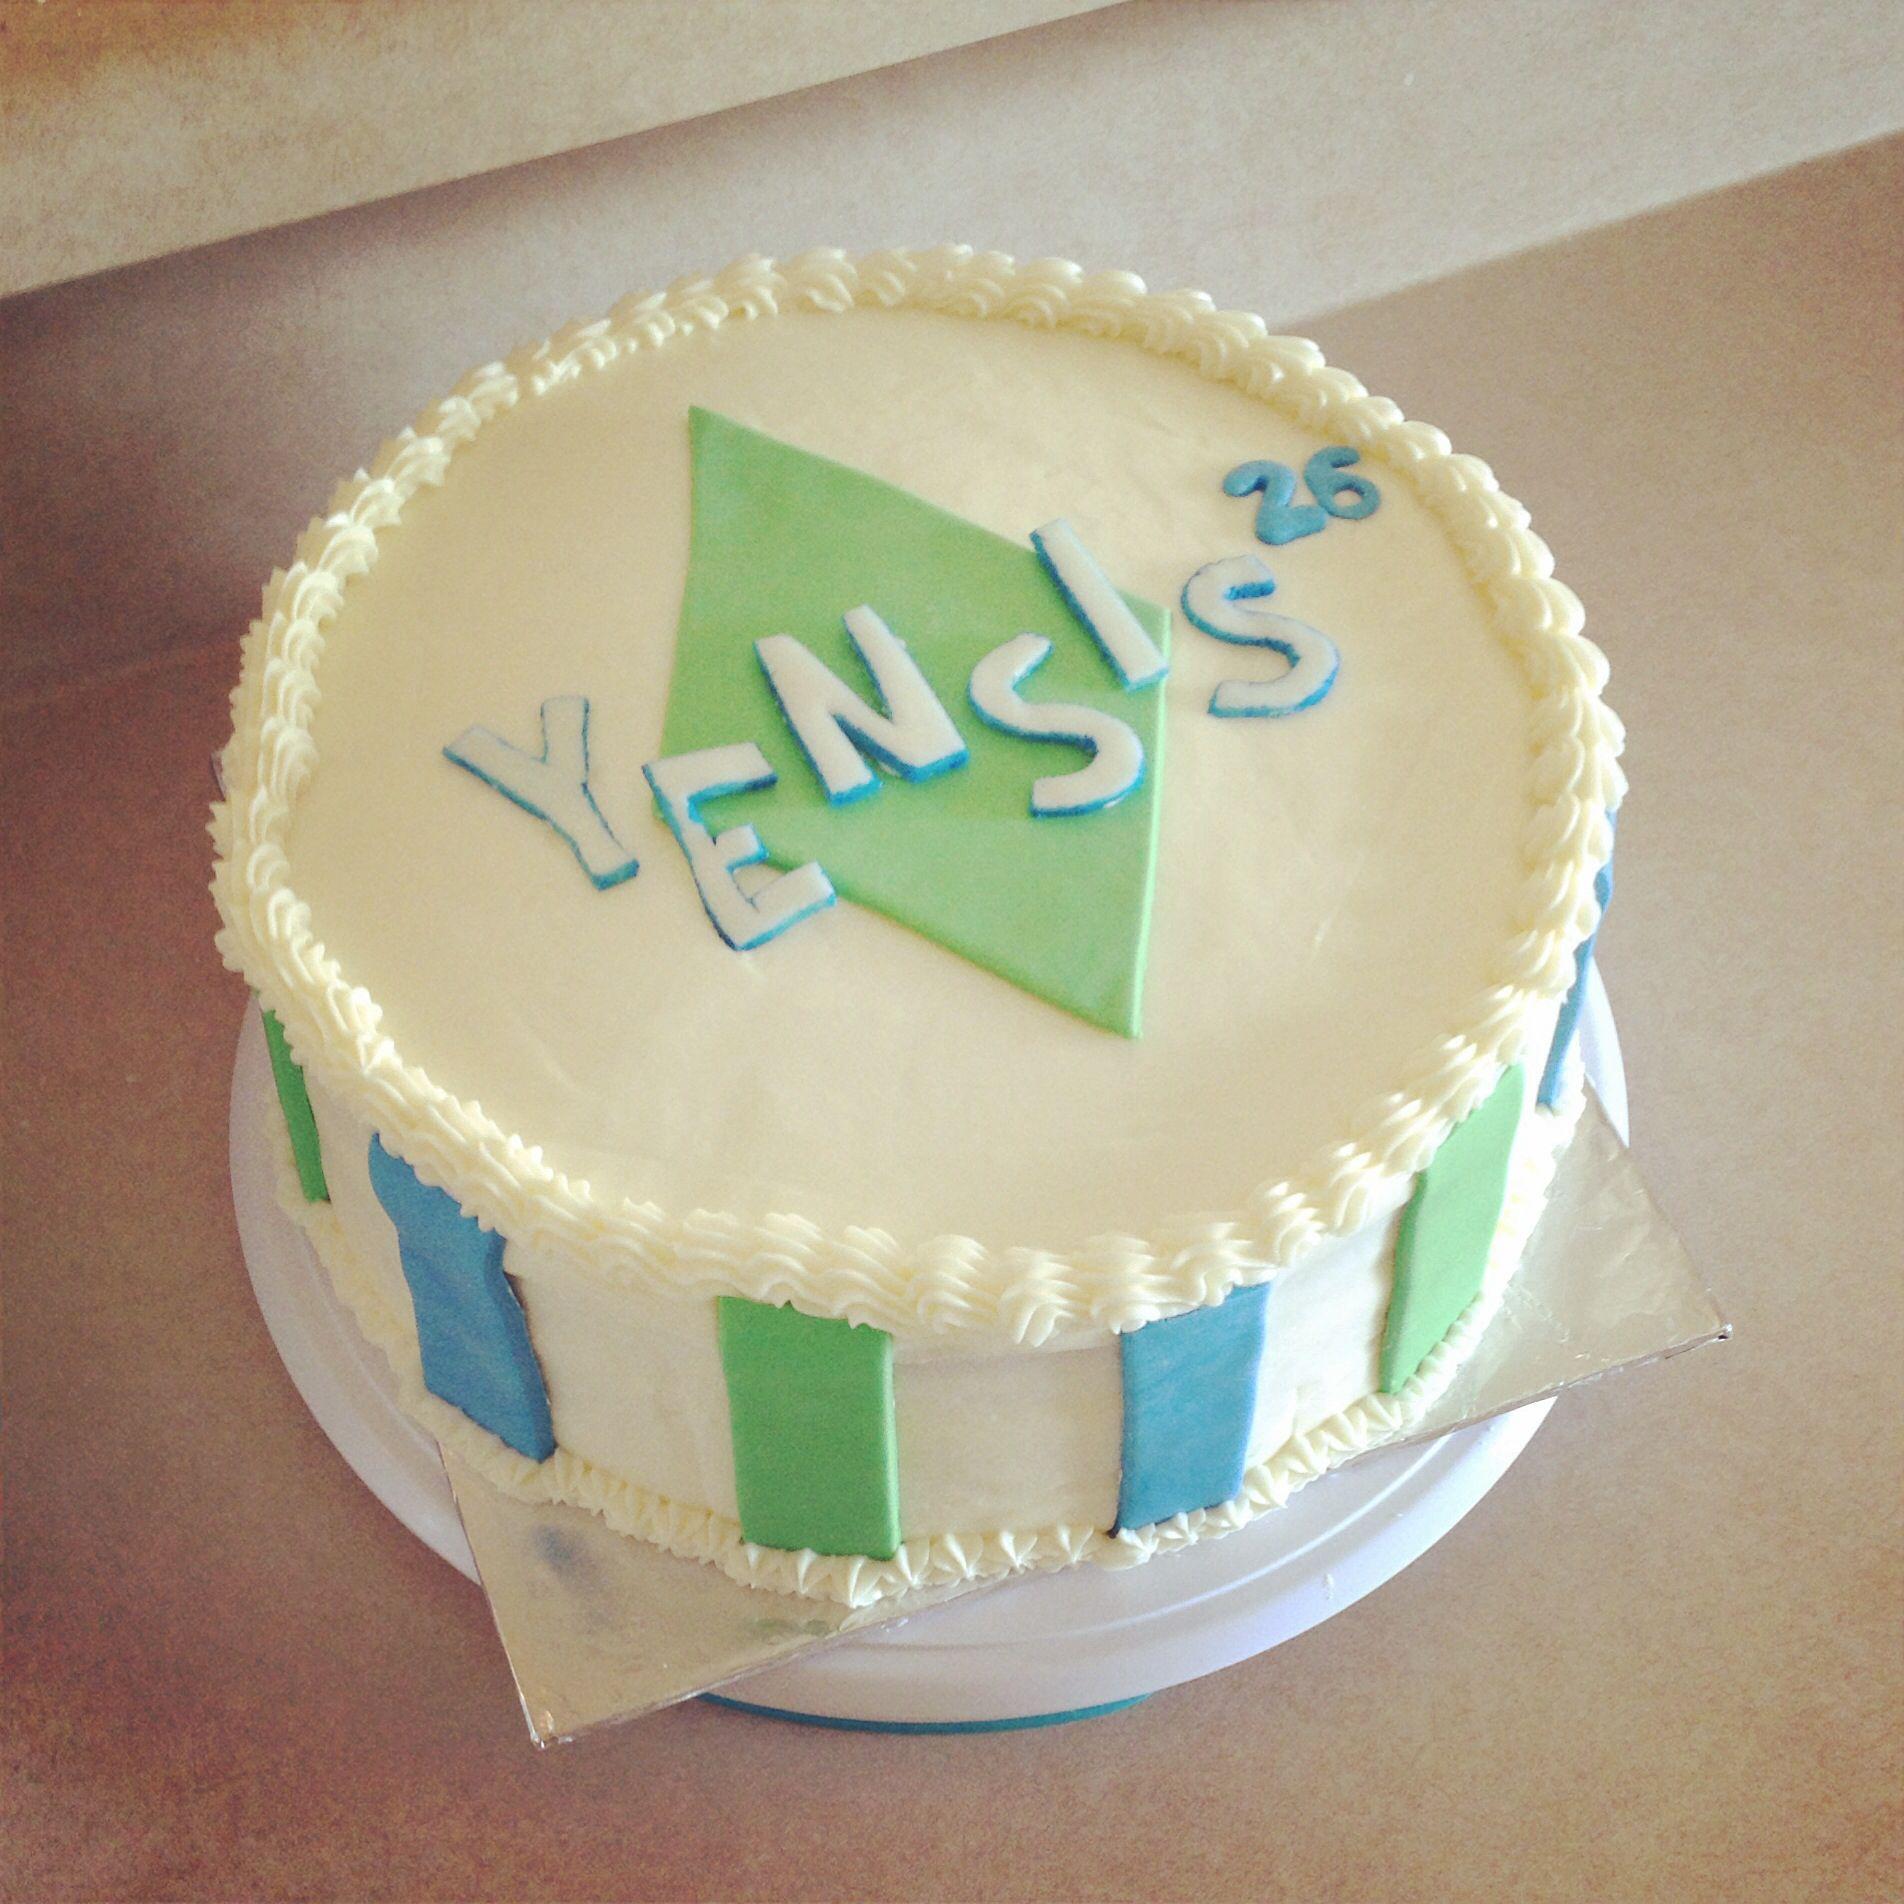 Sims inspired cake